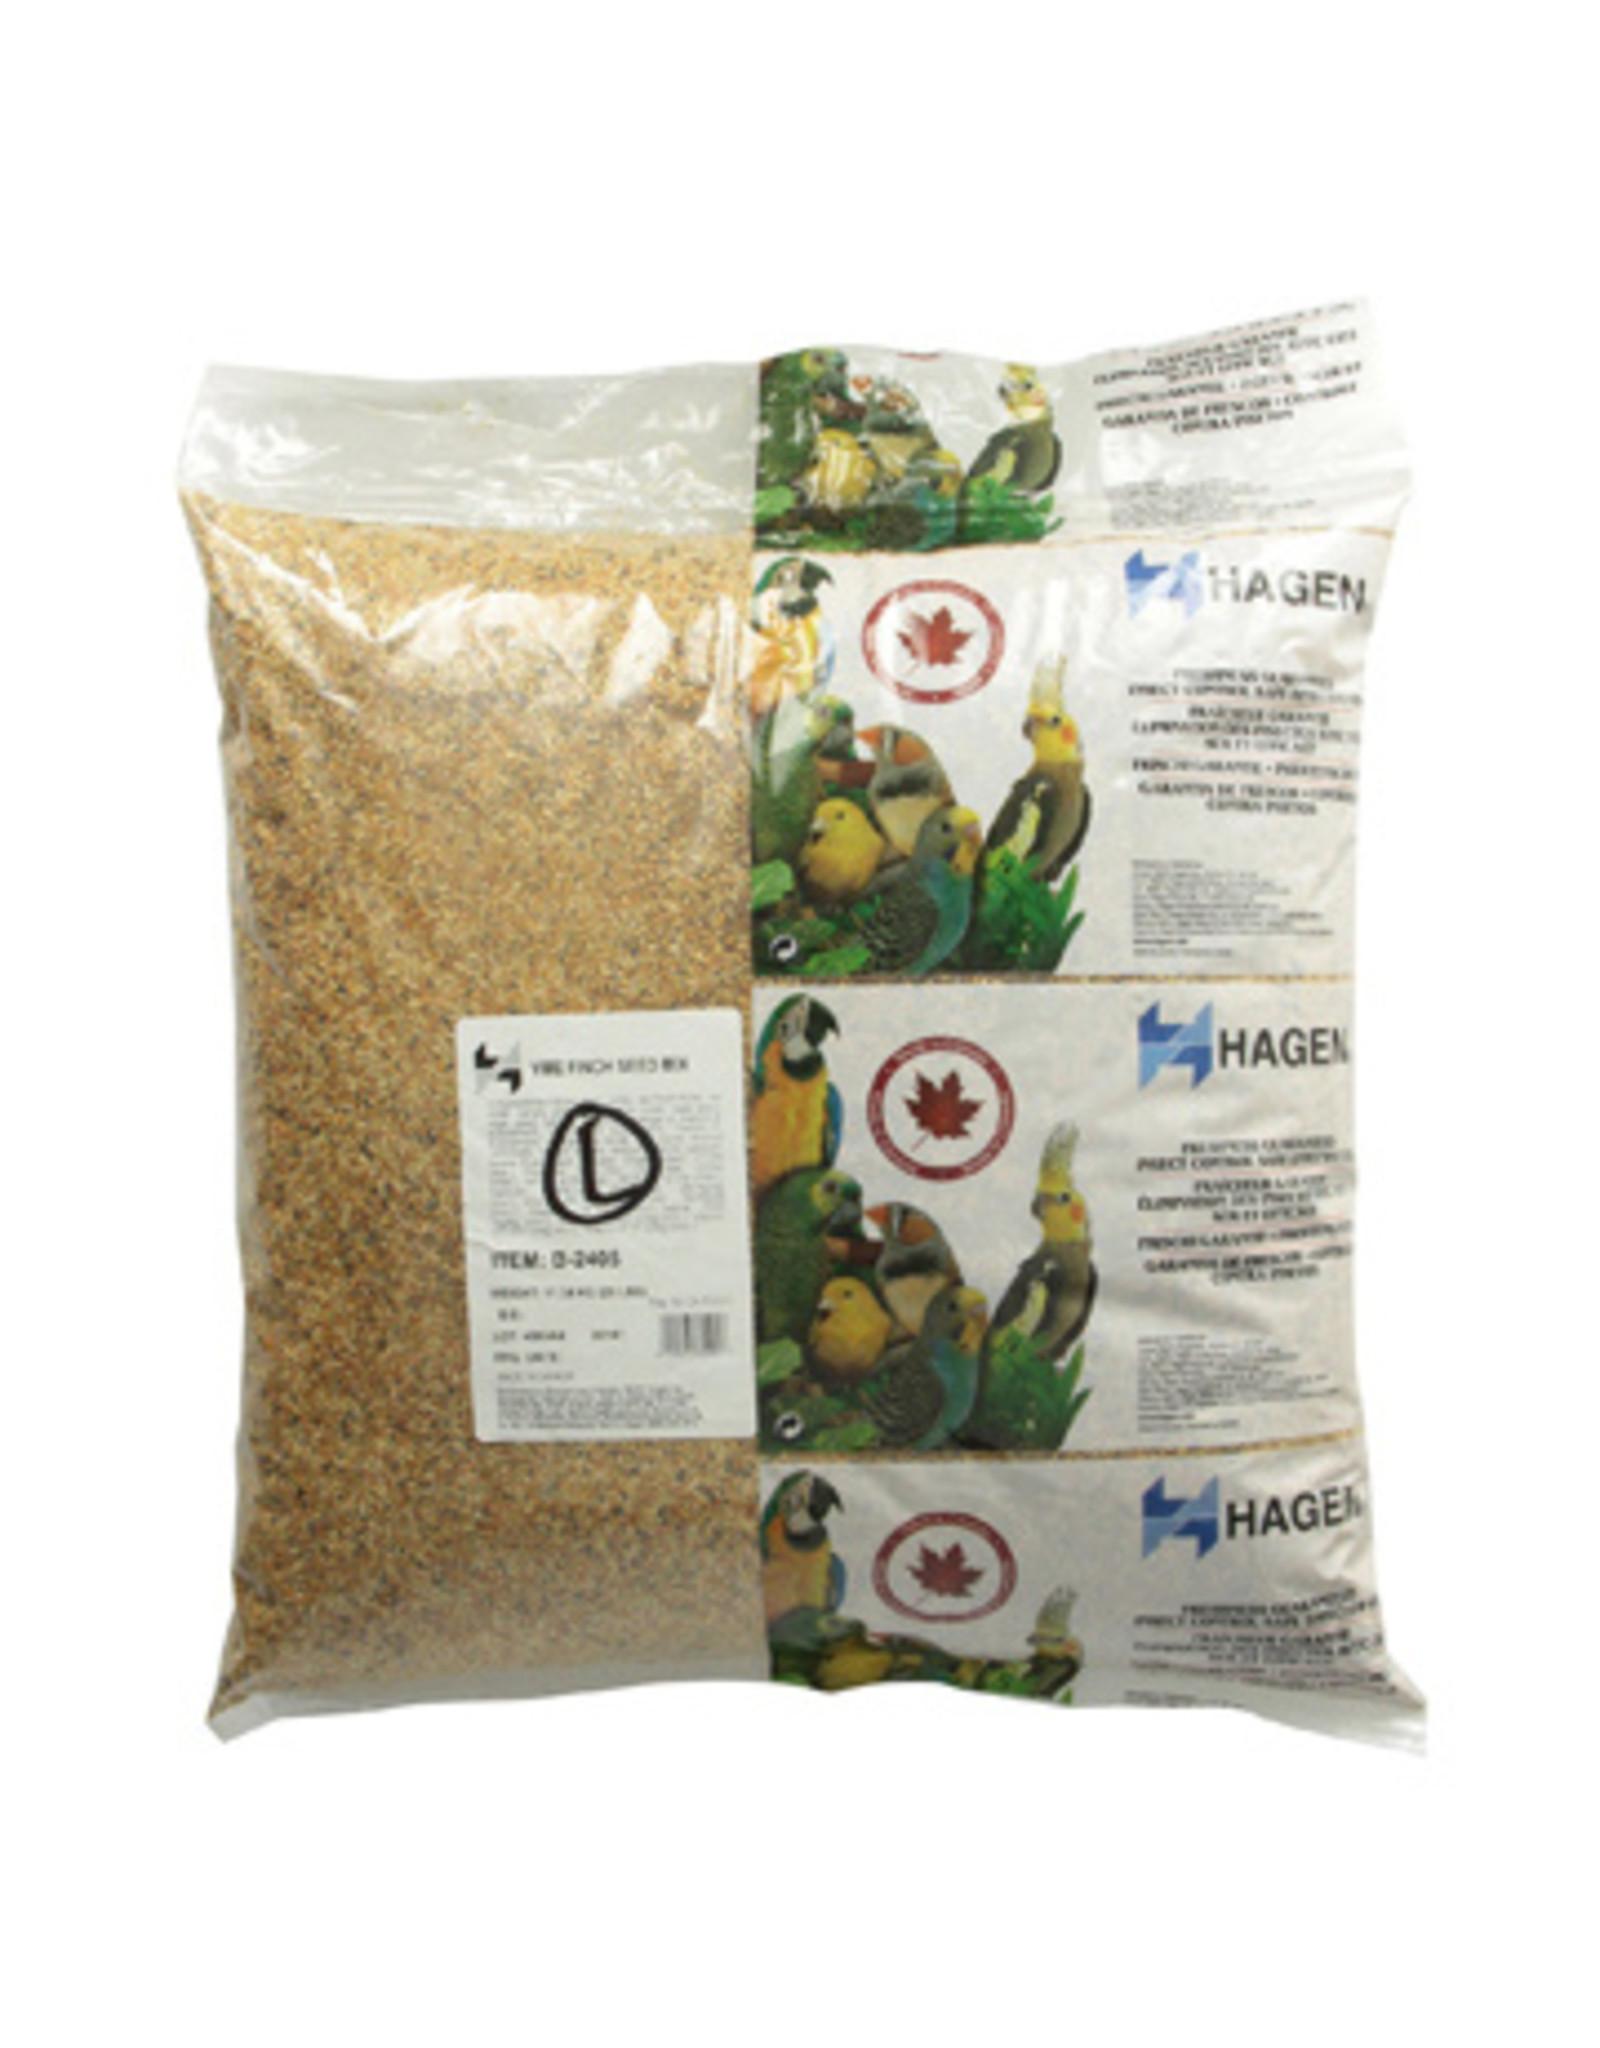 HG - Hagen Hagen Finch Staple VME Seed